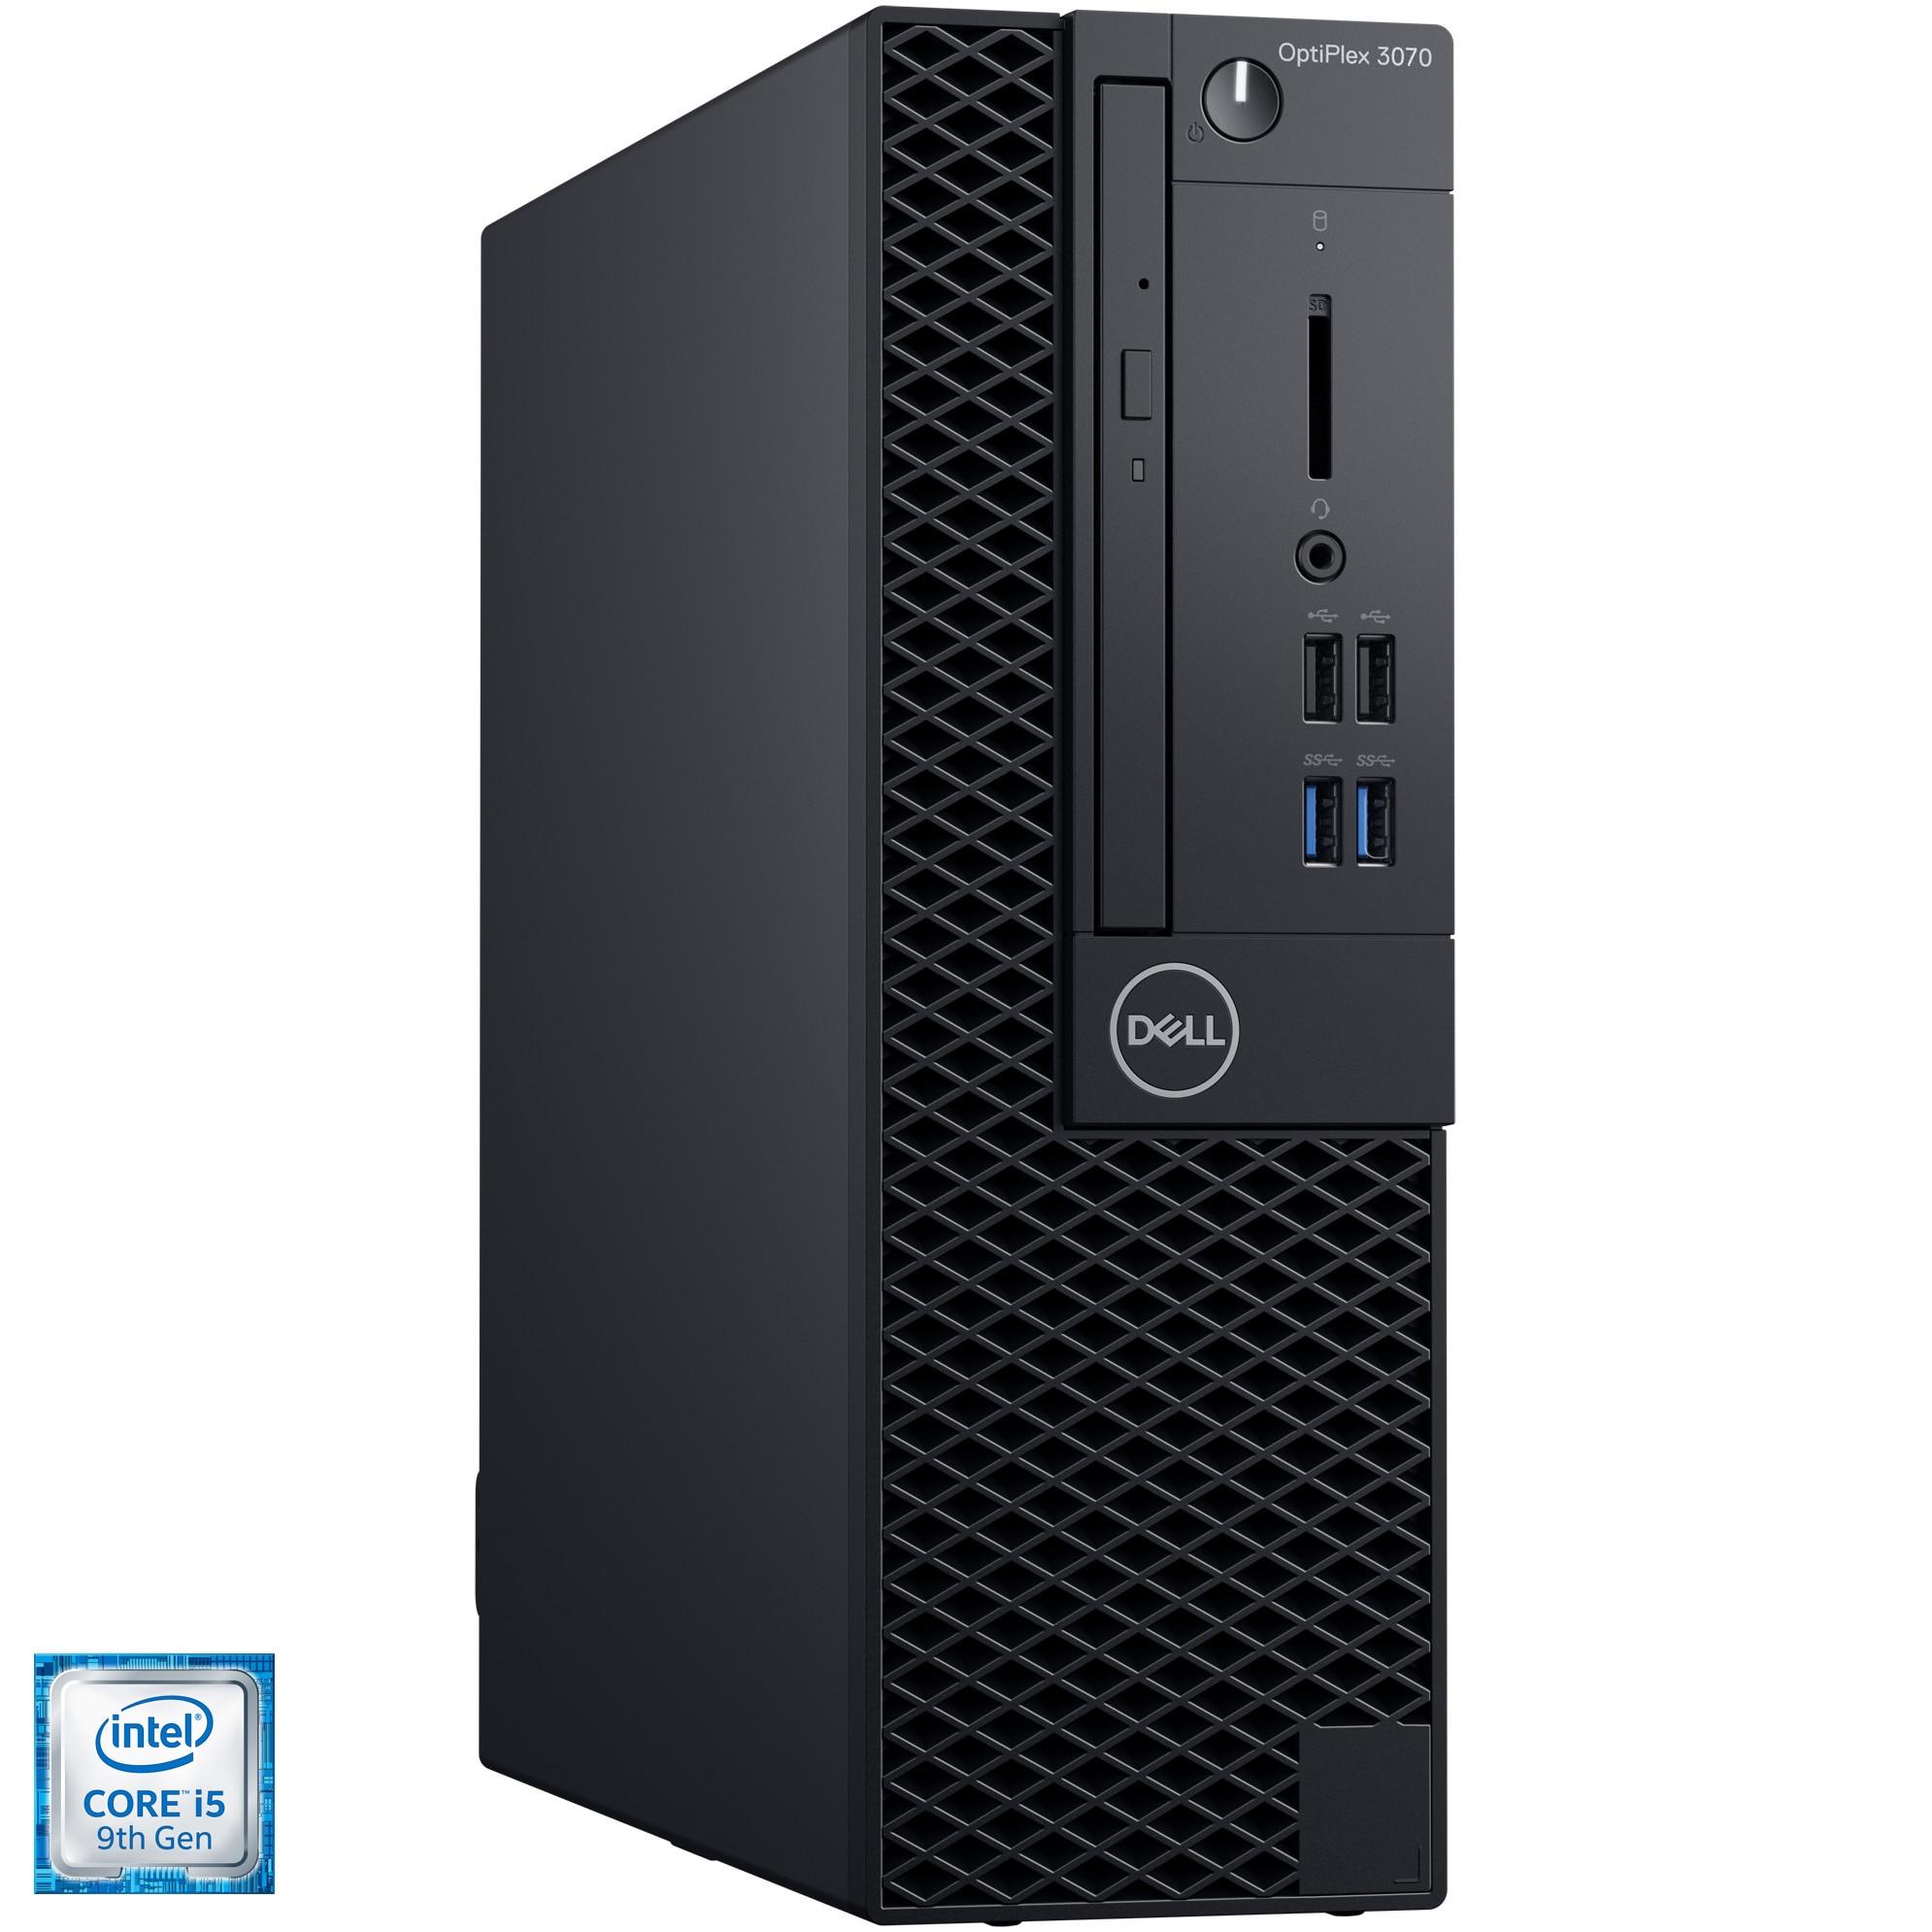 Fotografie Sistem Desktop PC OptiPlex 3070 SFF cu procesor Intel® Core™ i5-9500 pana la 4.40 GHz, Coffee Lake, 4GB, 1TB, Intel® UHD Graphics 630, Microsoft Windows 10 Pro